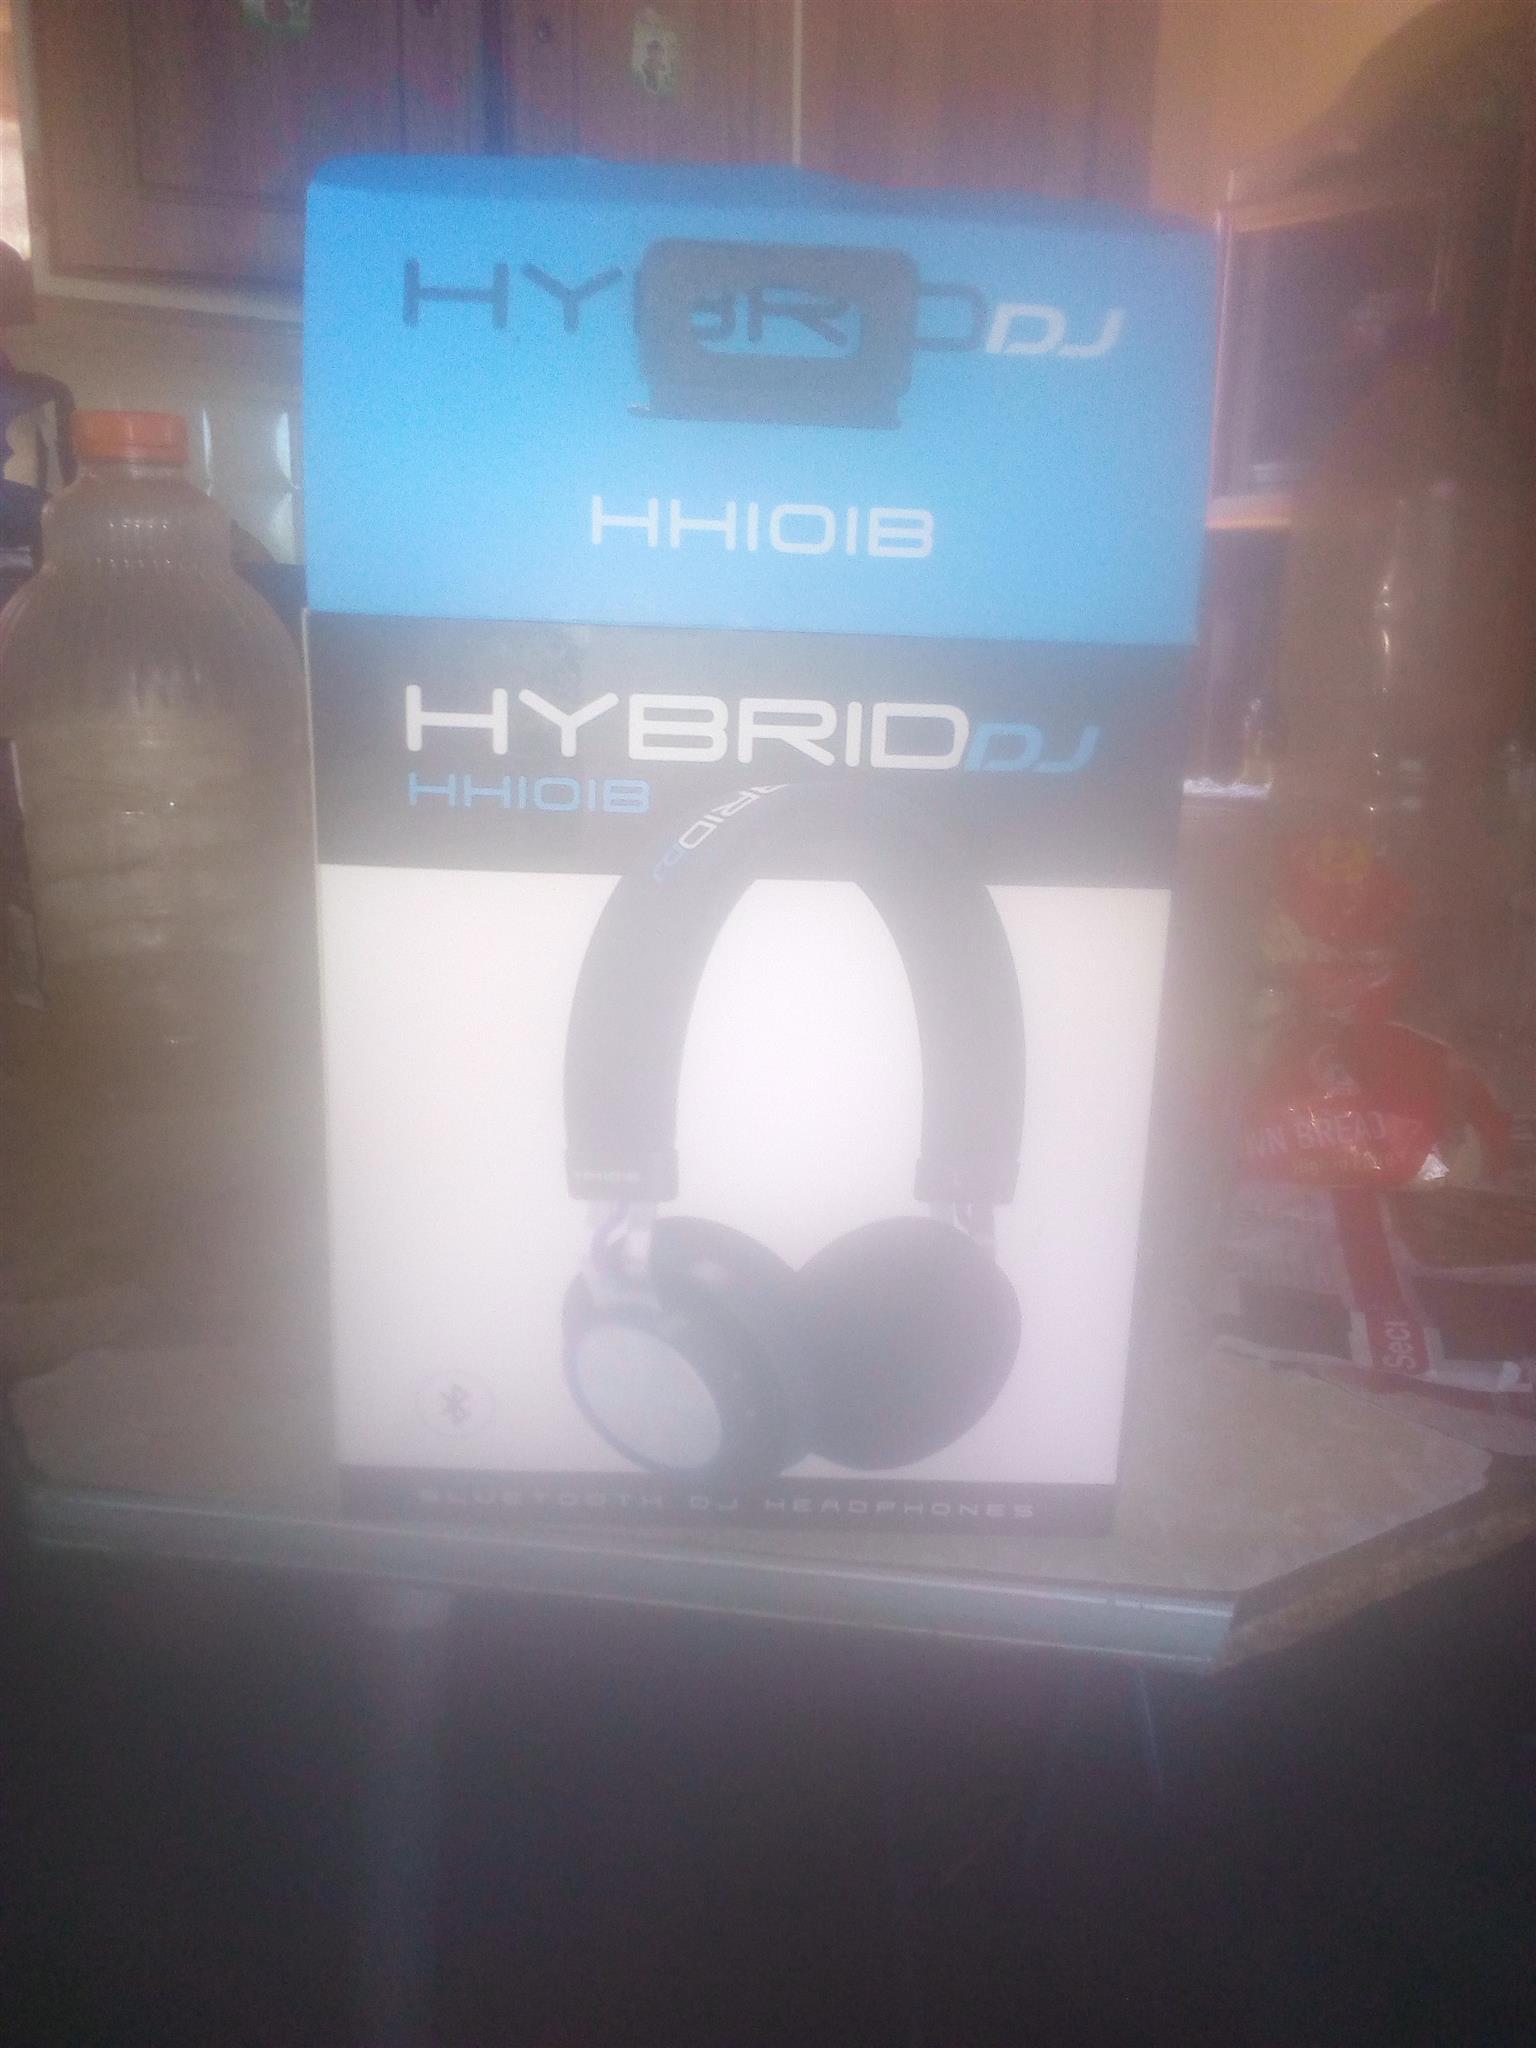 Hybrid dj headphones